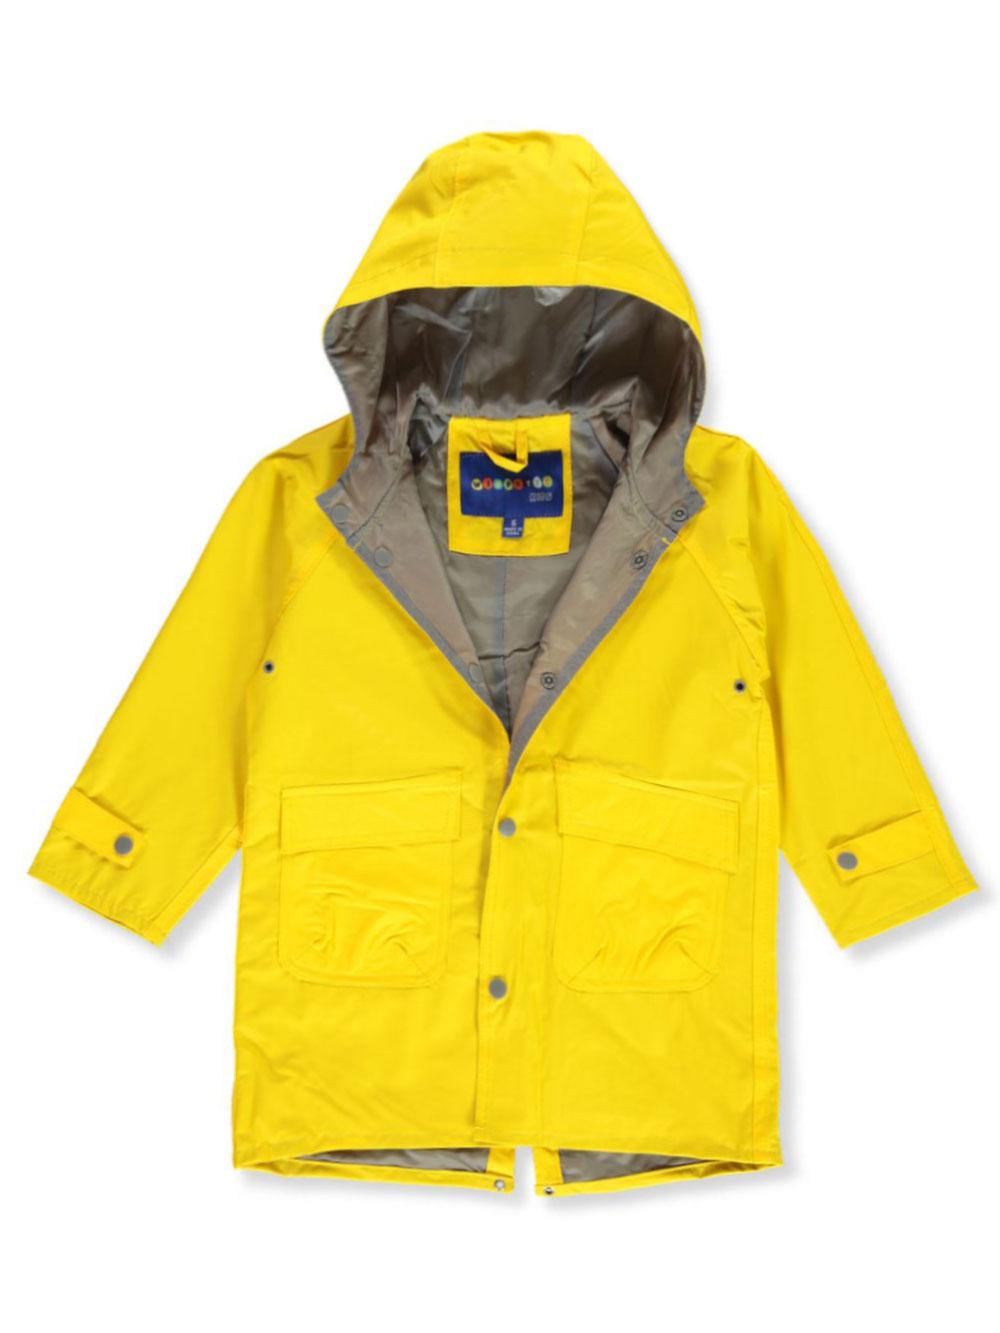 fac655976 Wippette Boys' Raincoat